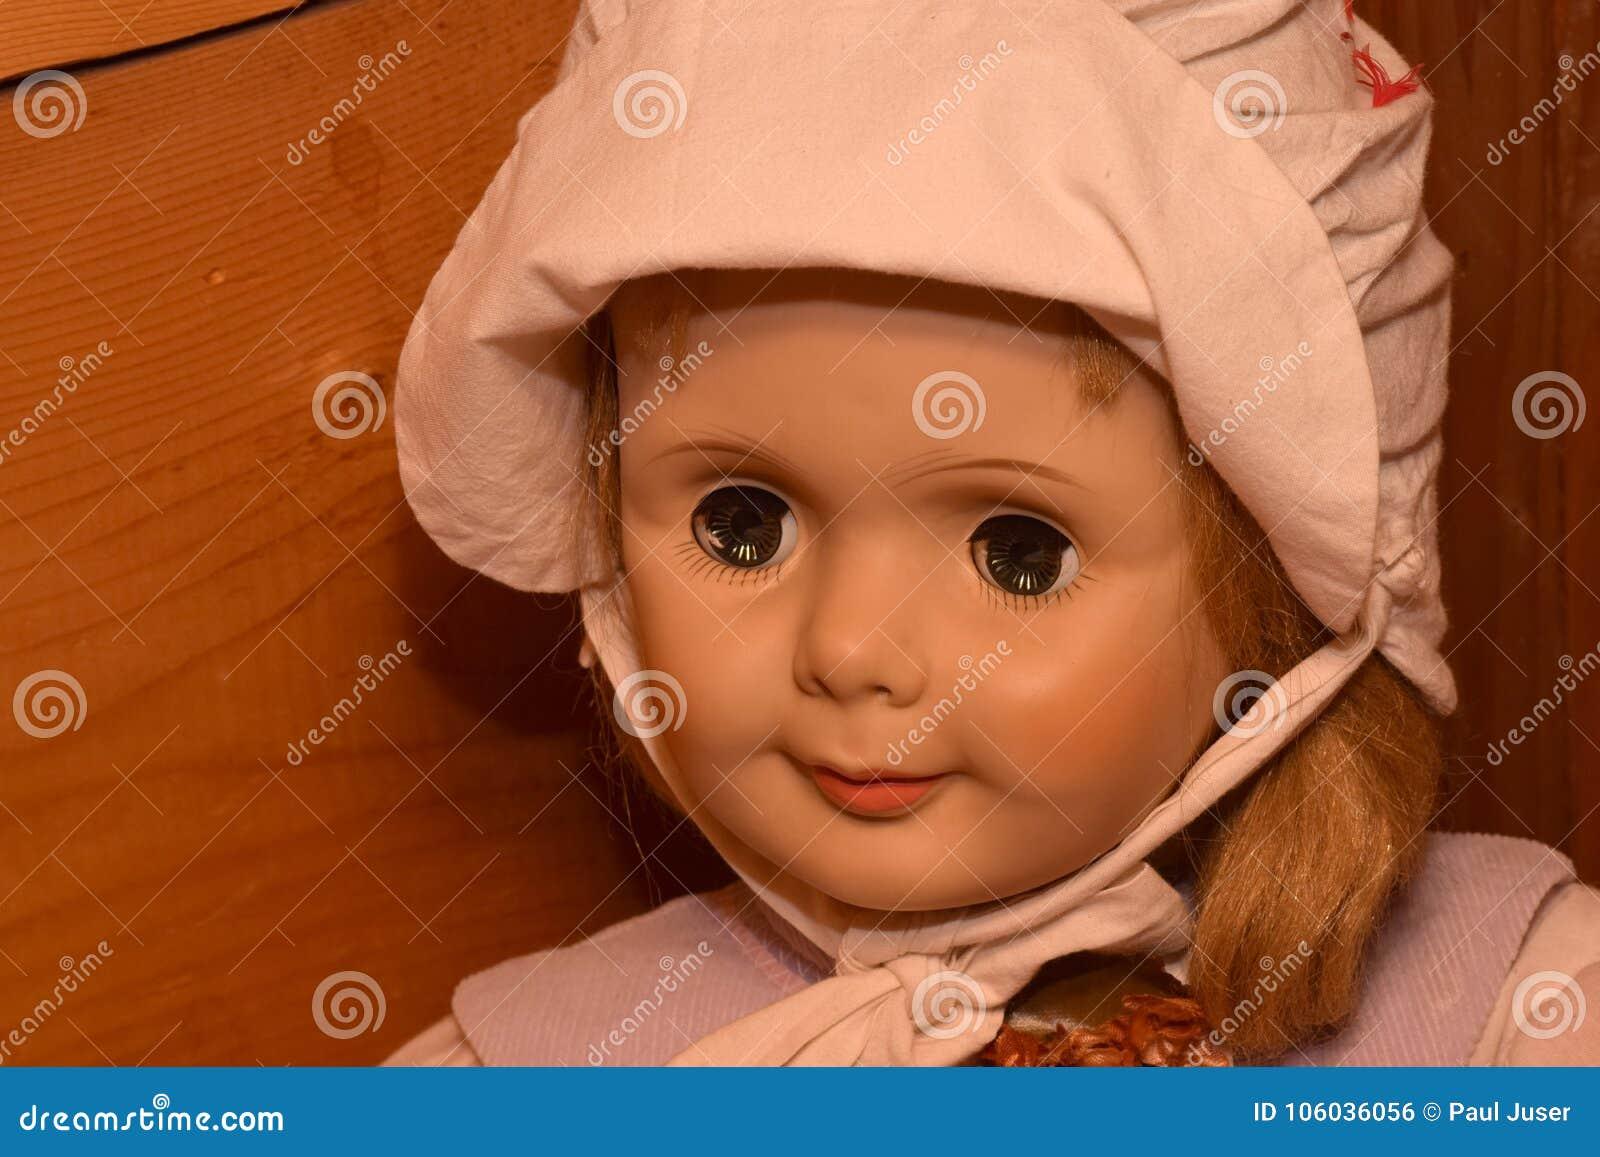 dolls with creepy eyes stock photo. image of spooky - 106036056